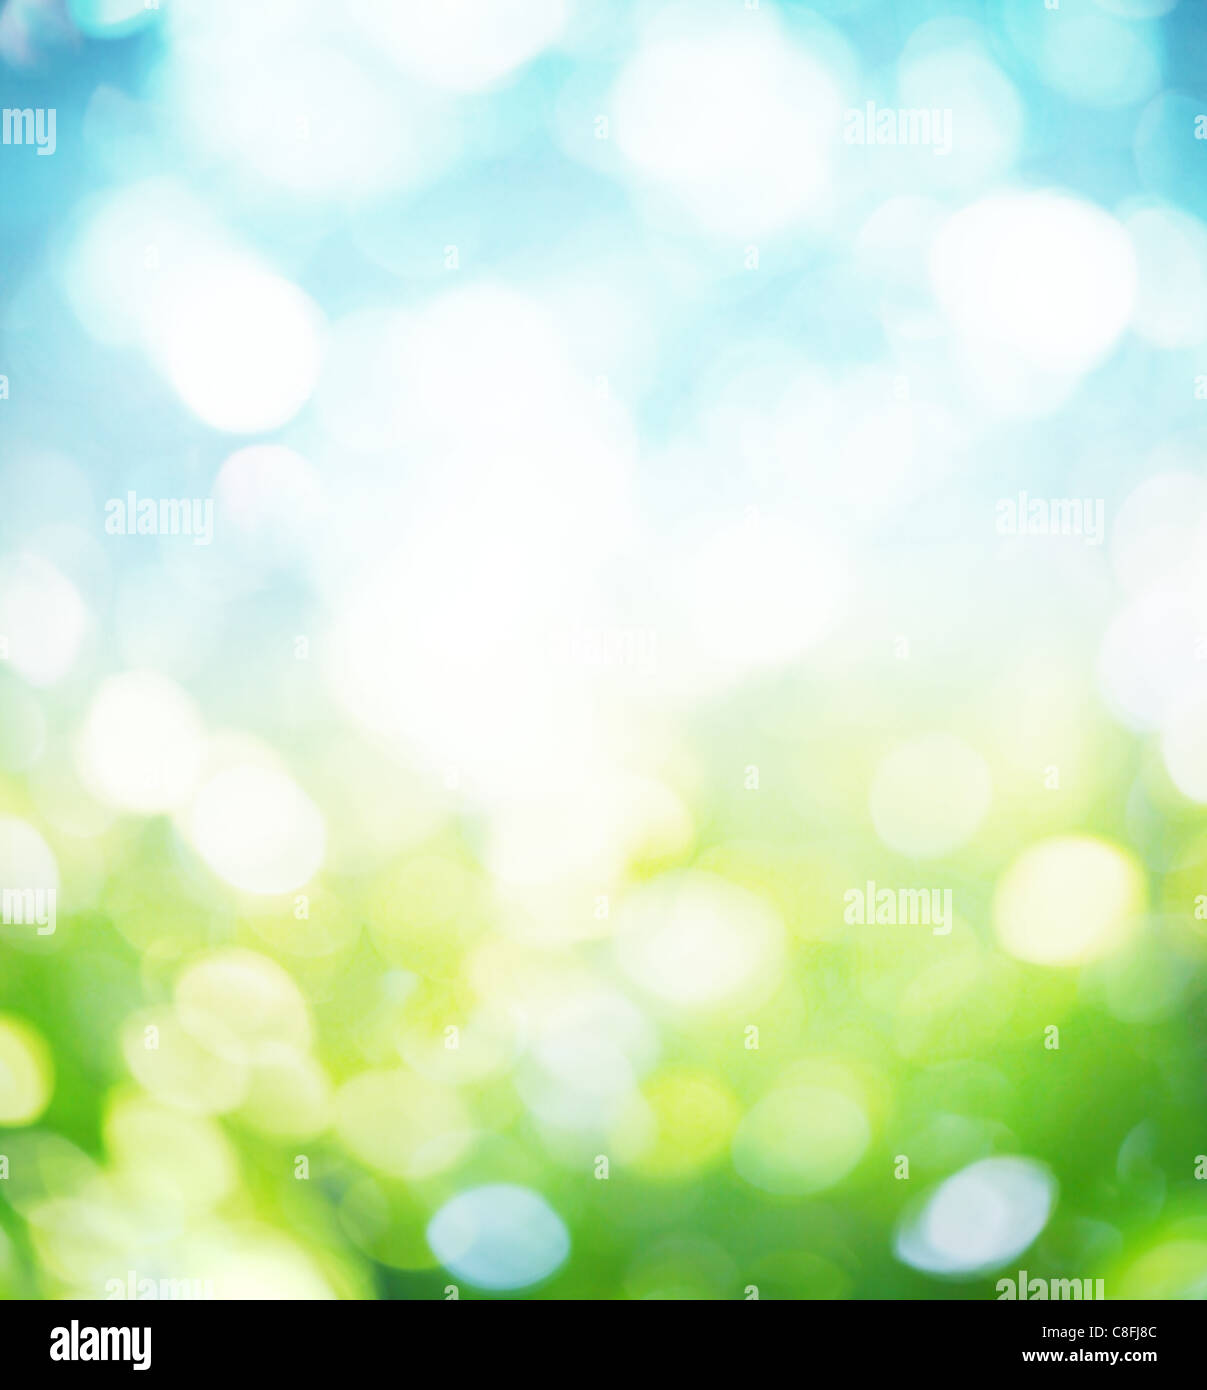 Nature blur background. - Stock Image